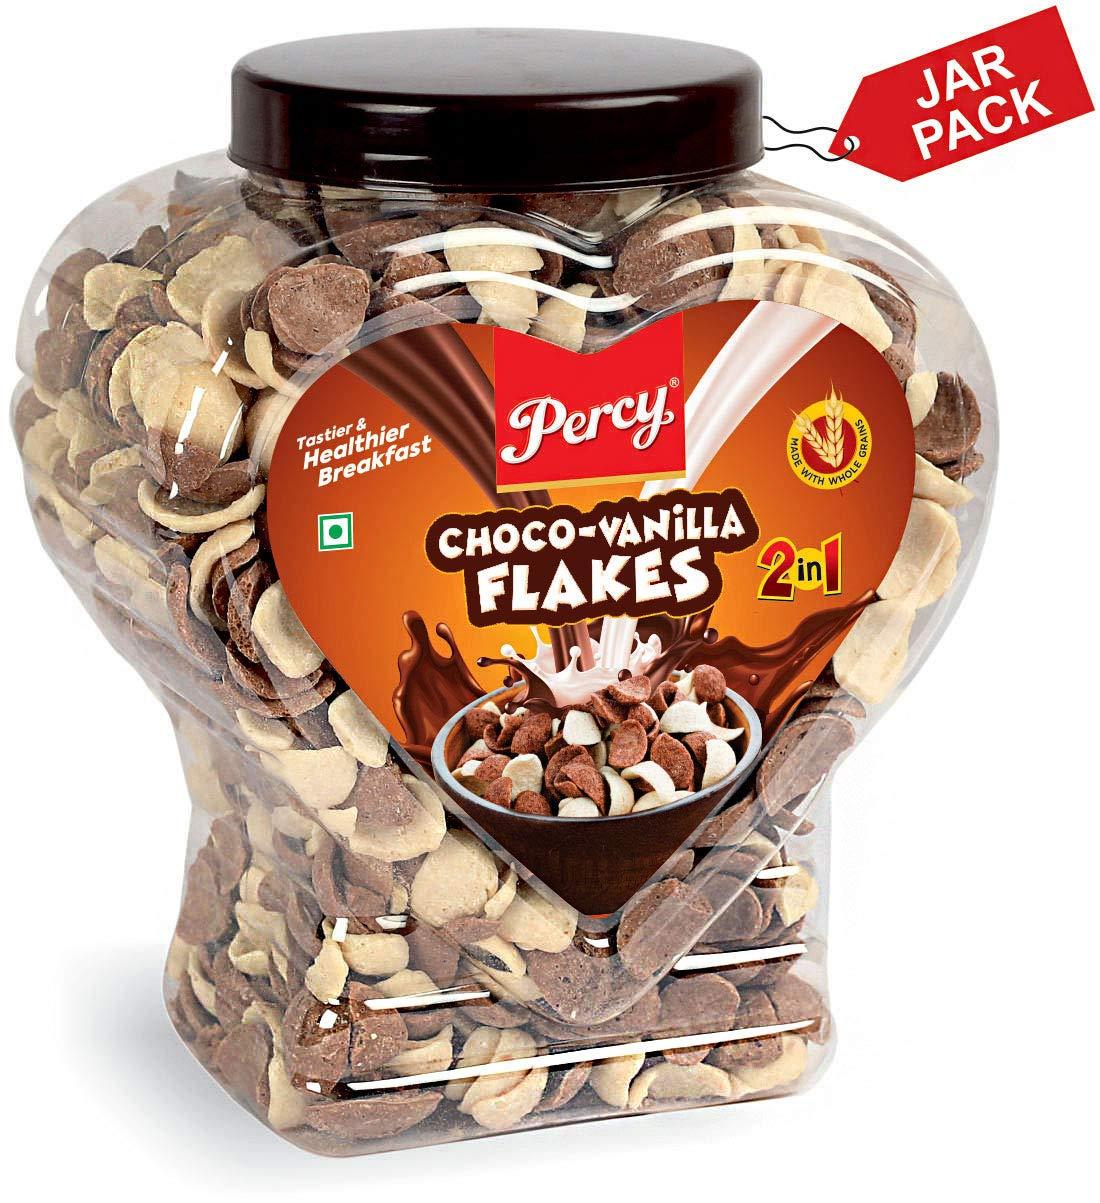 Percy Breakfast Cereal, Choco Vanilla Flakes, Jumbo Jar at Rs.182